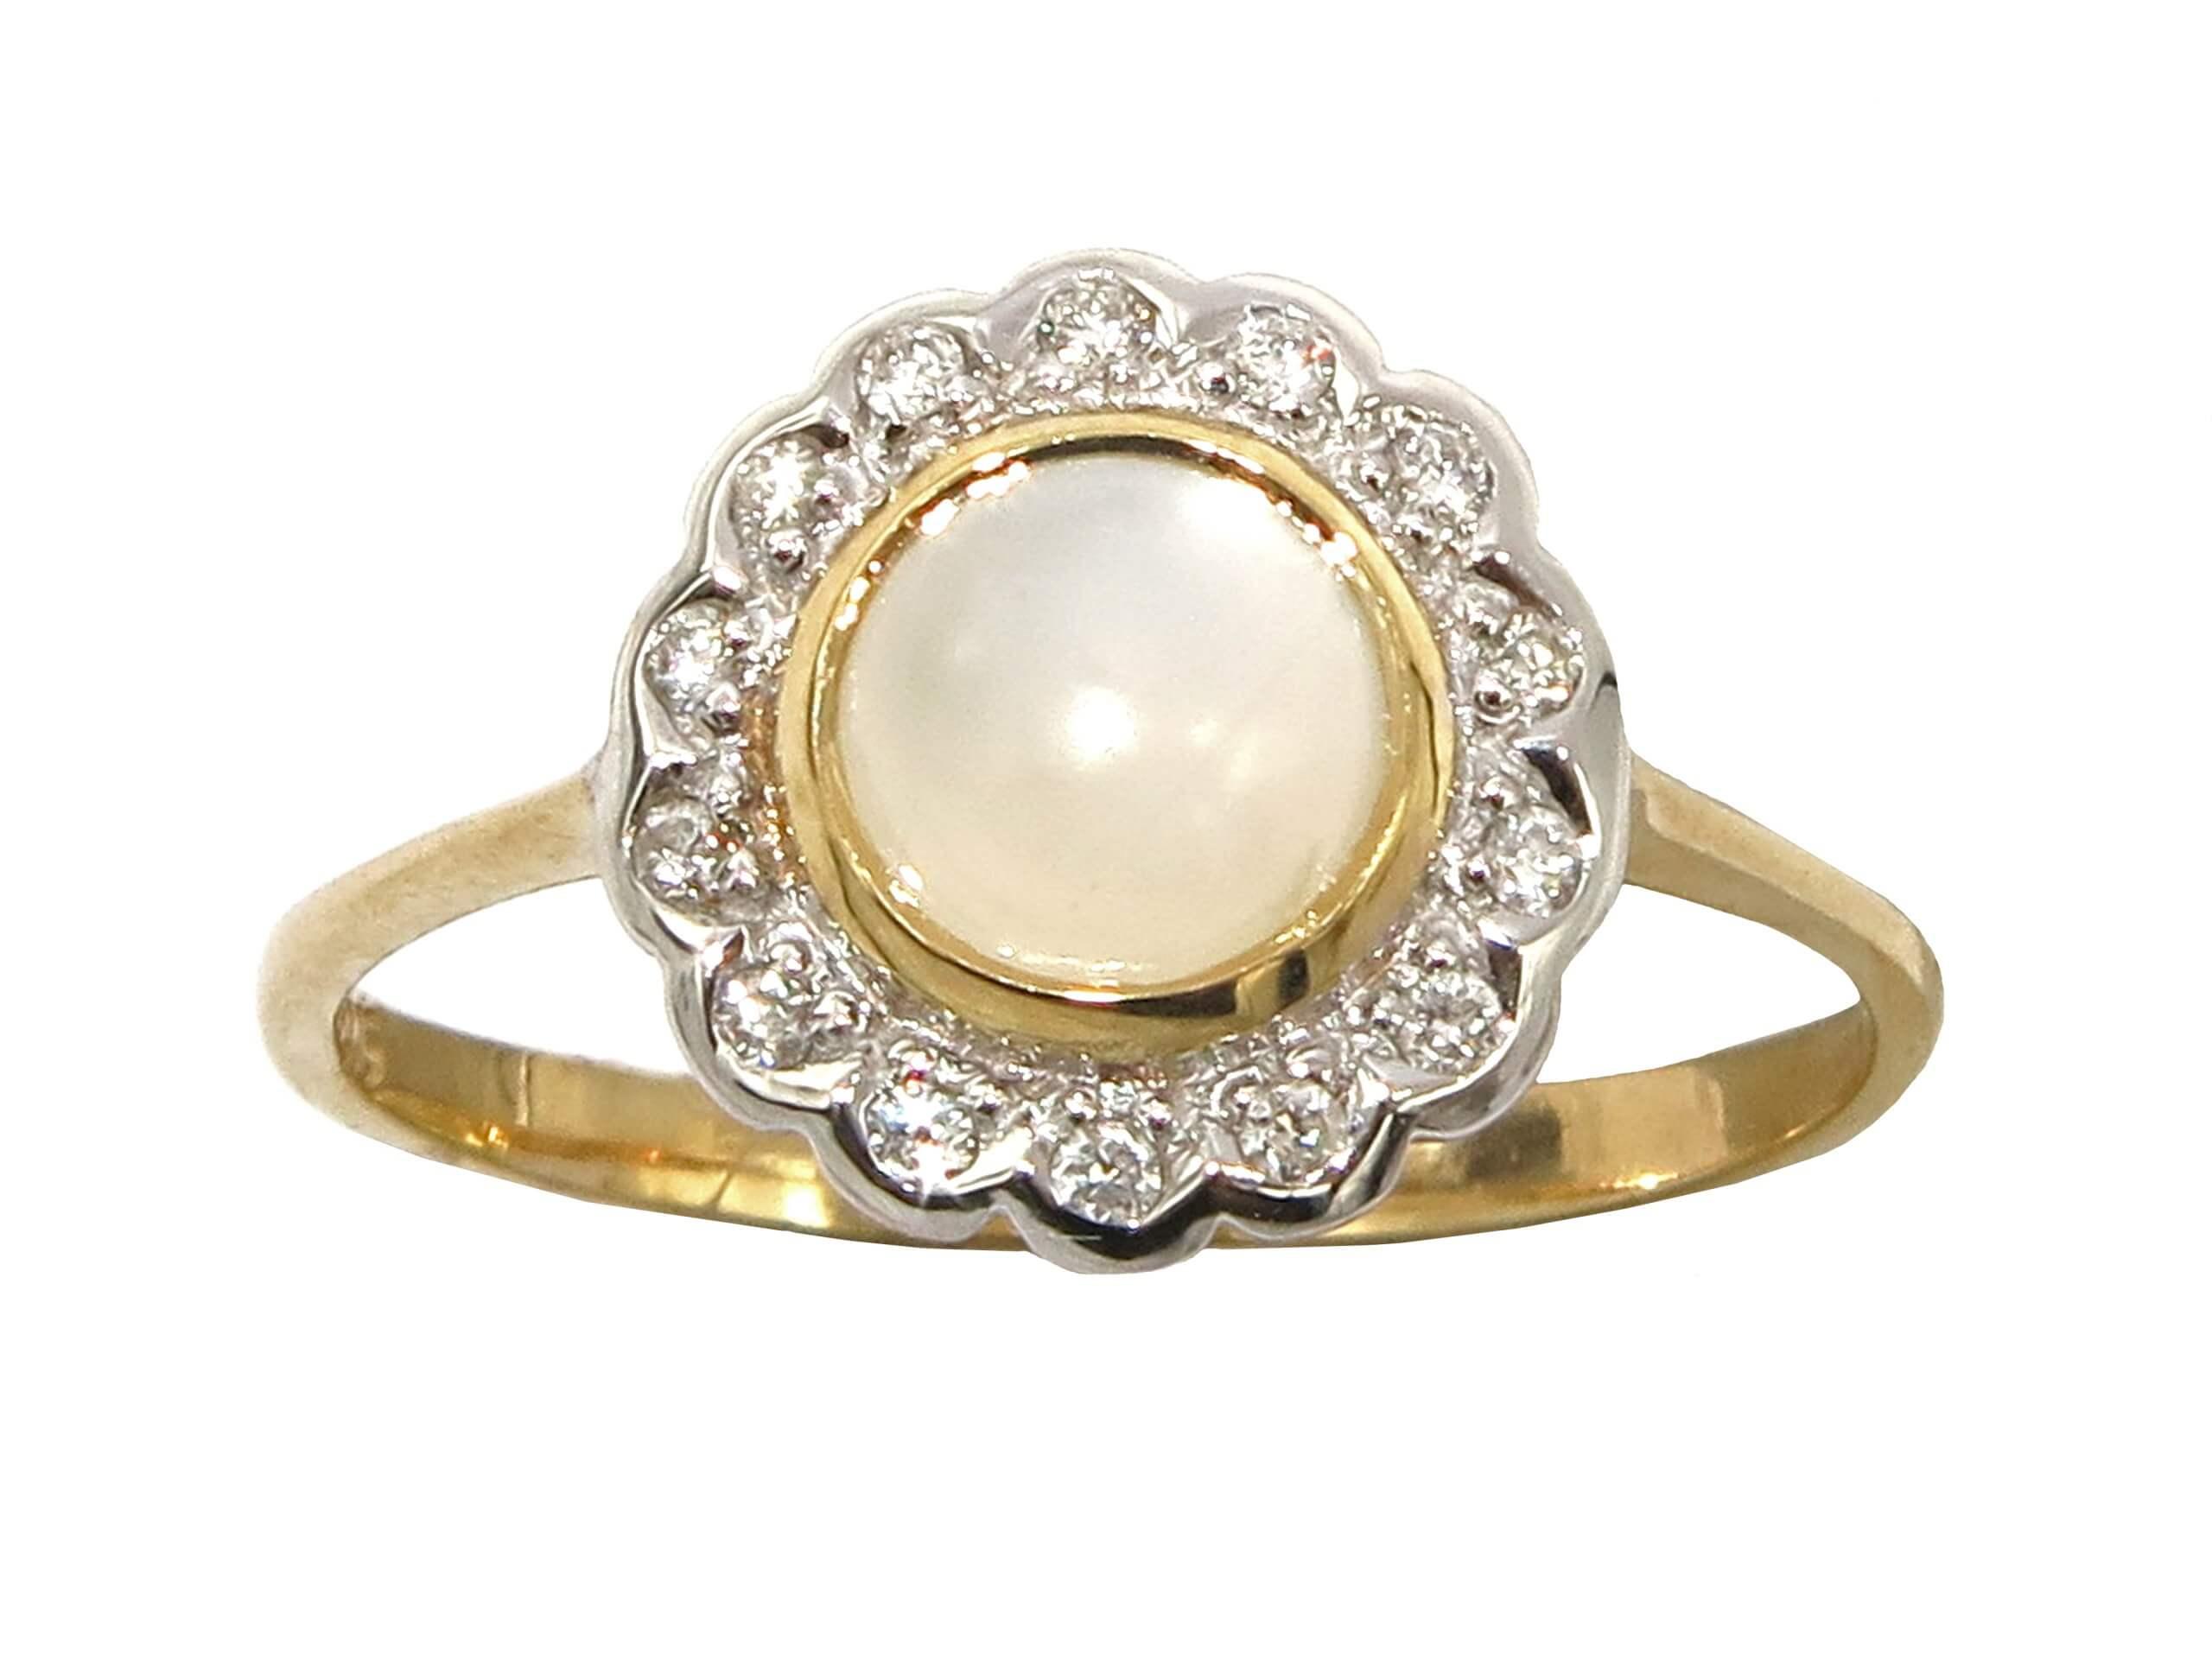 MOONSTONE AND DIAMOND RING MJ24390